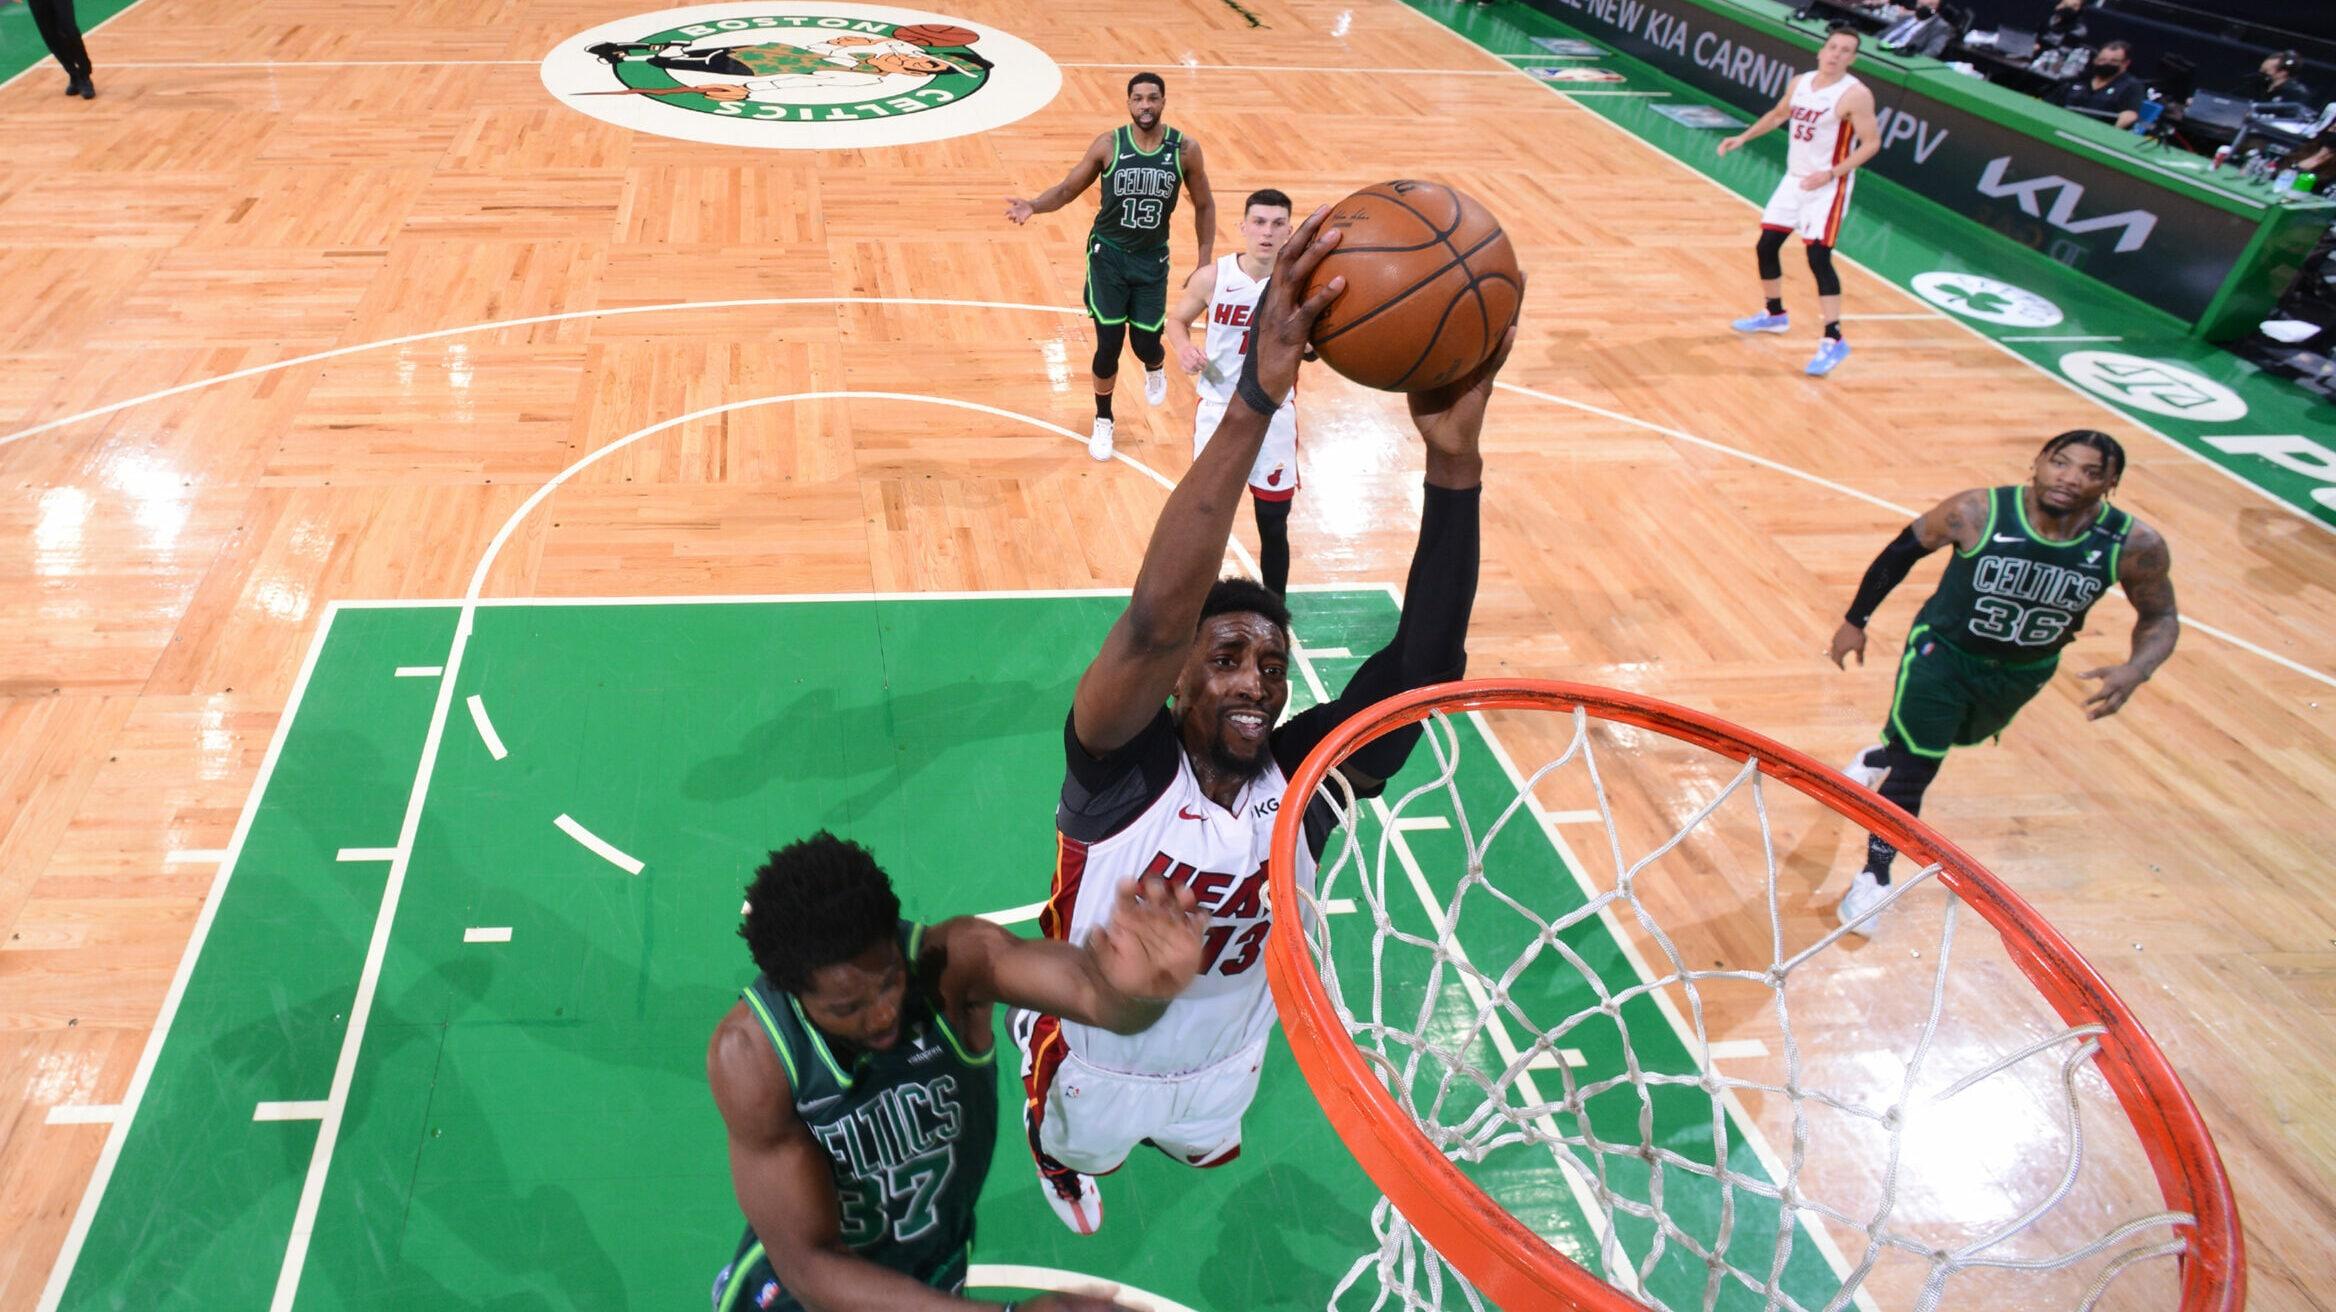 Heat clinch playoff spot, deal blow to reeling Celtics